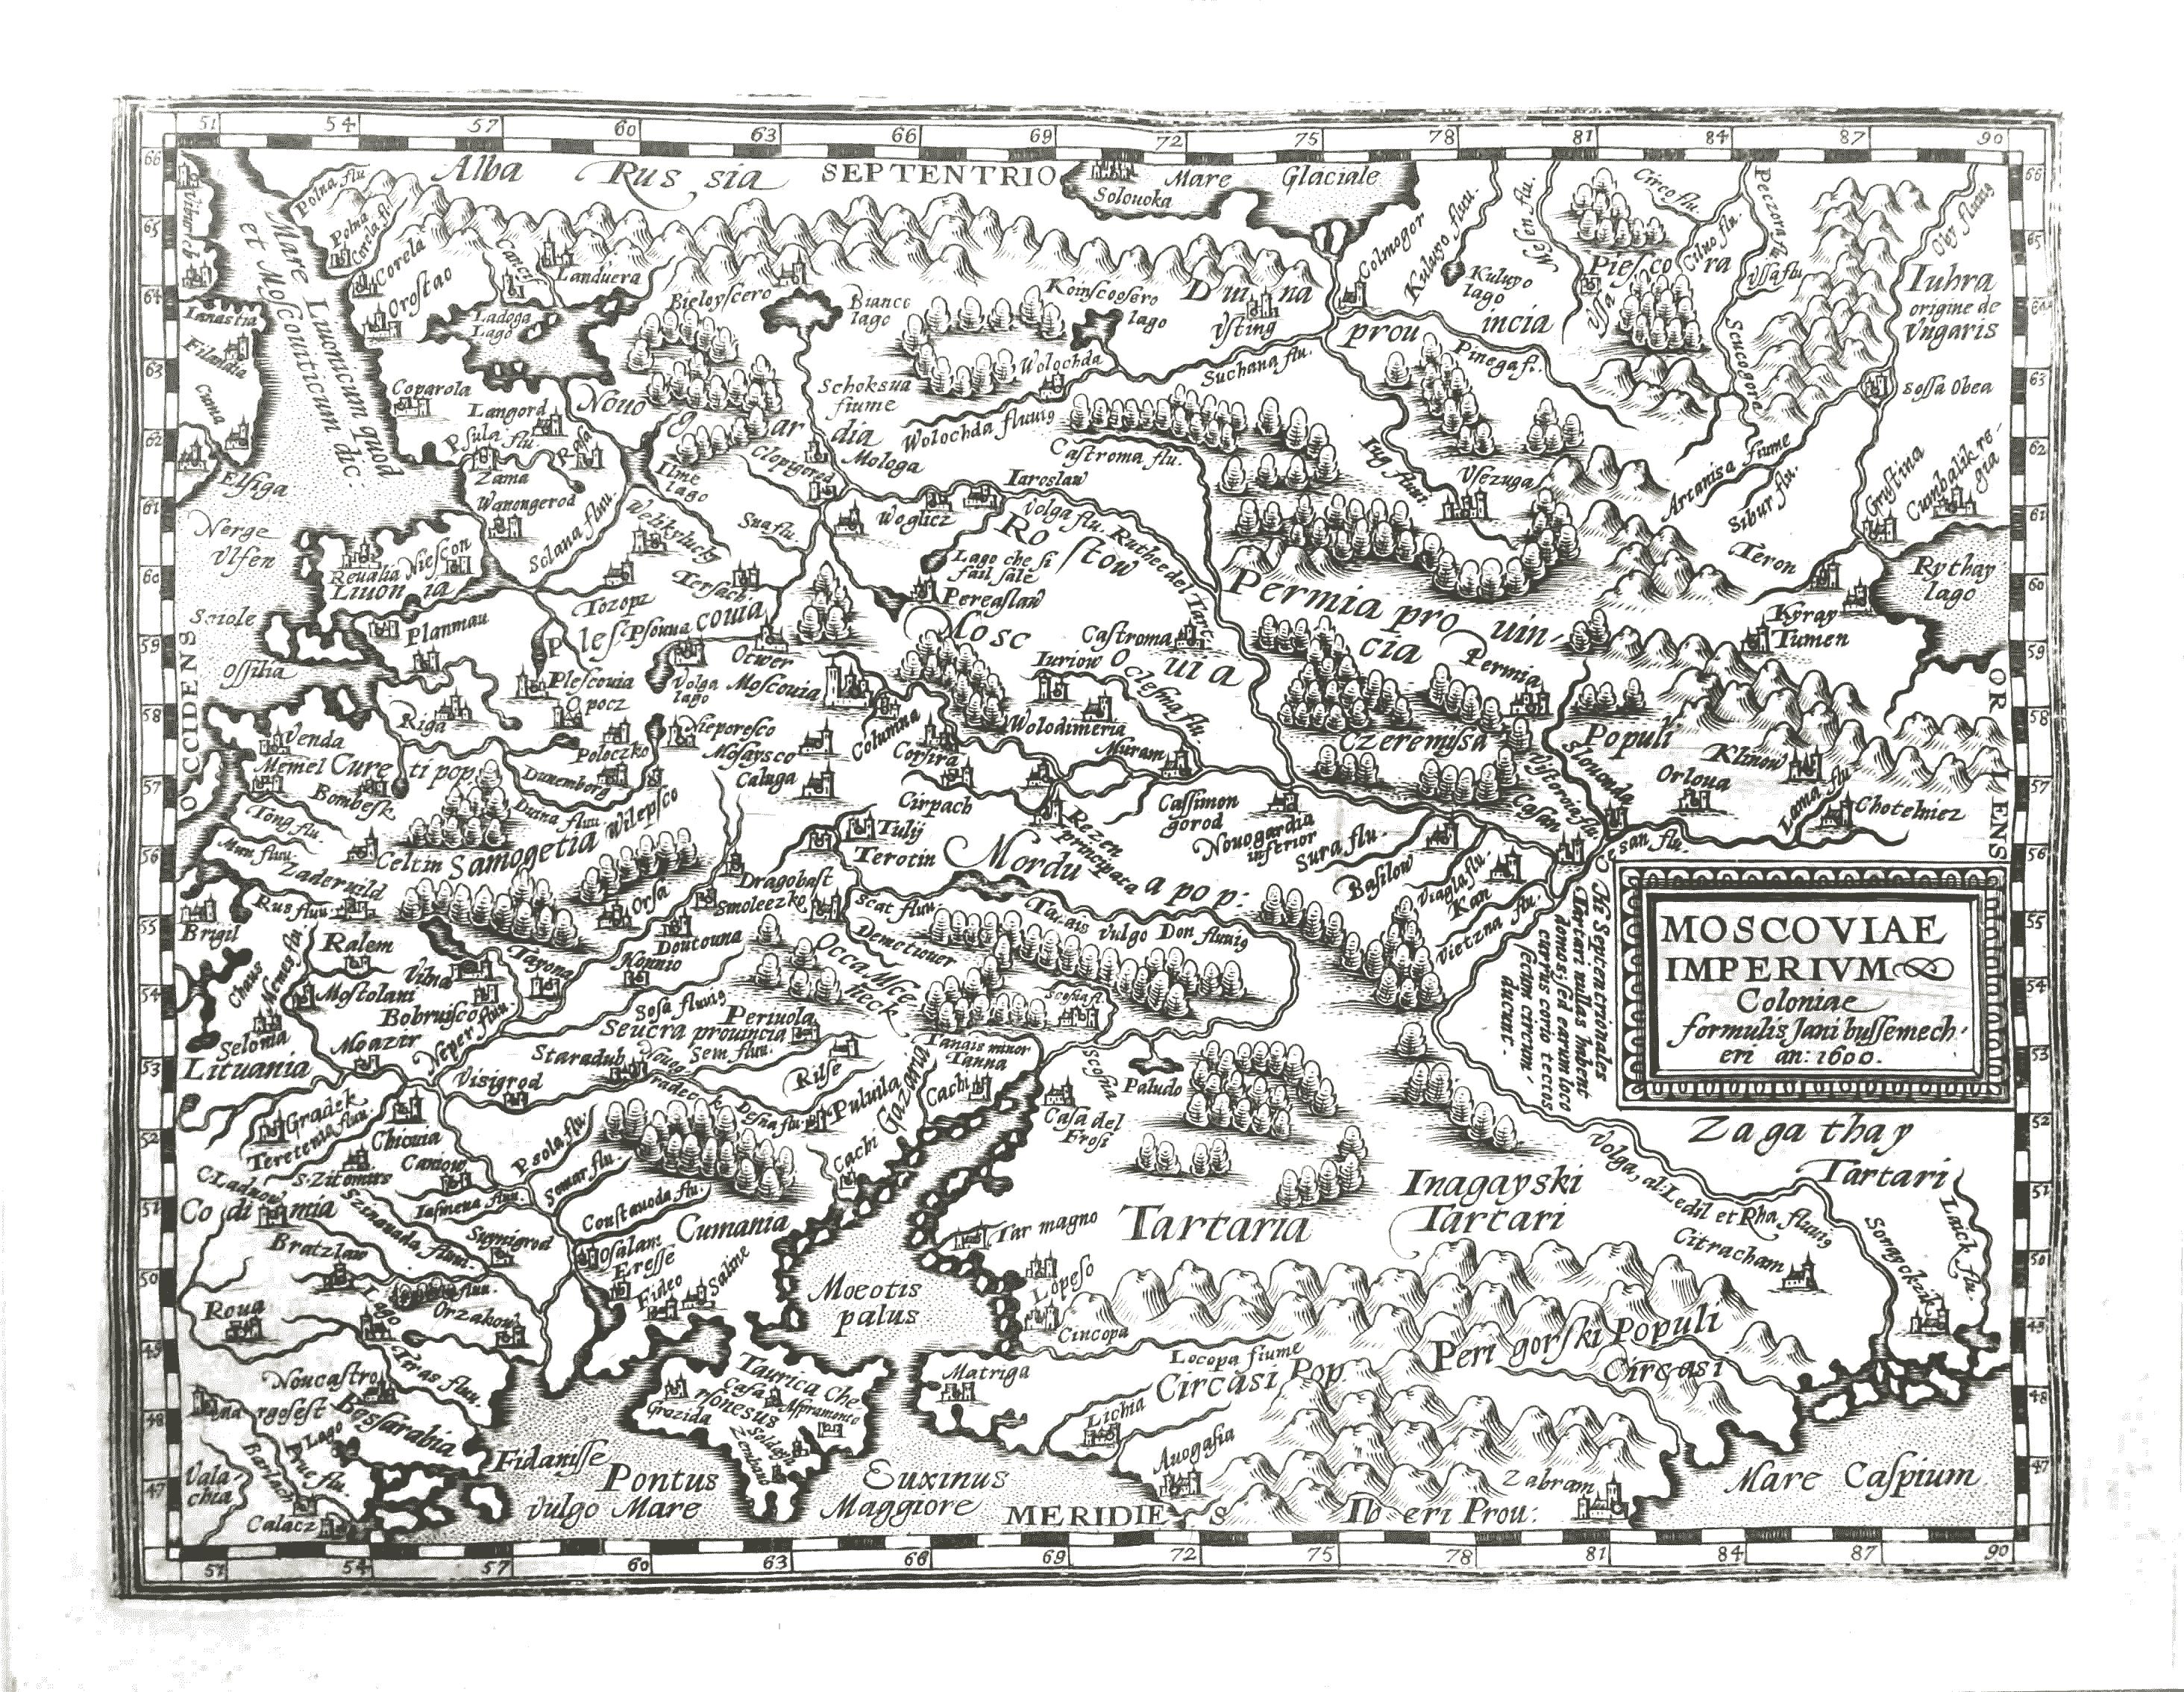 Карта Московии XVI века передана в дар Звенигородскому музею